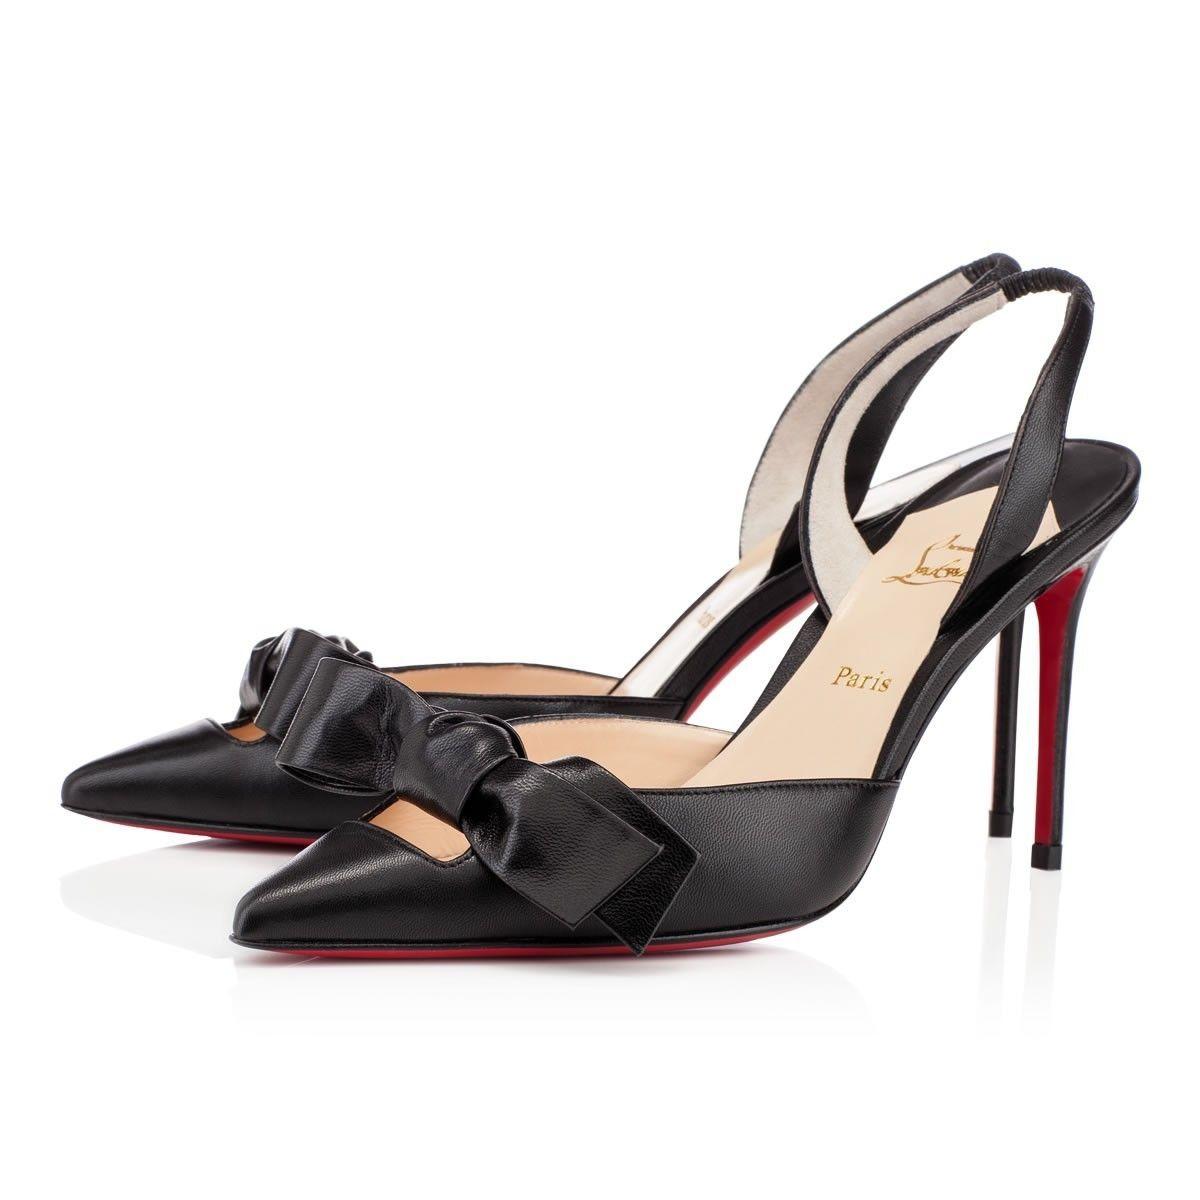 Chaussure Louboutin Pas Cher Escarpins Washington Kid 85mm Noir 0 #chaussure